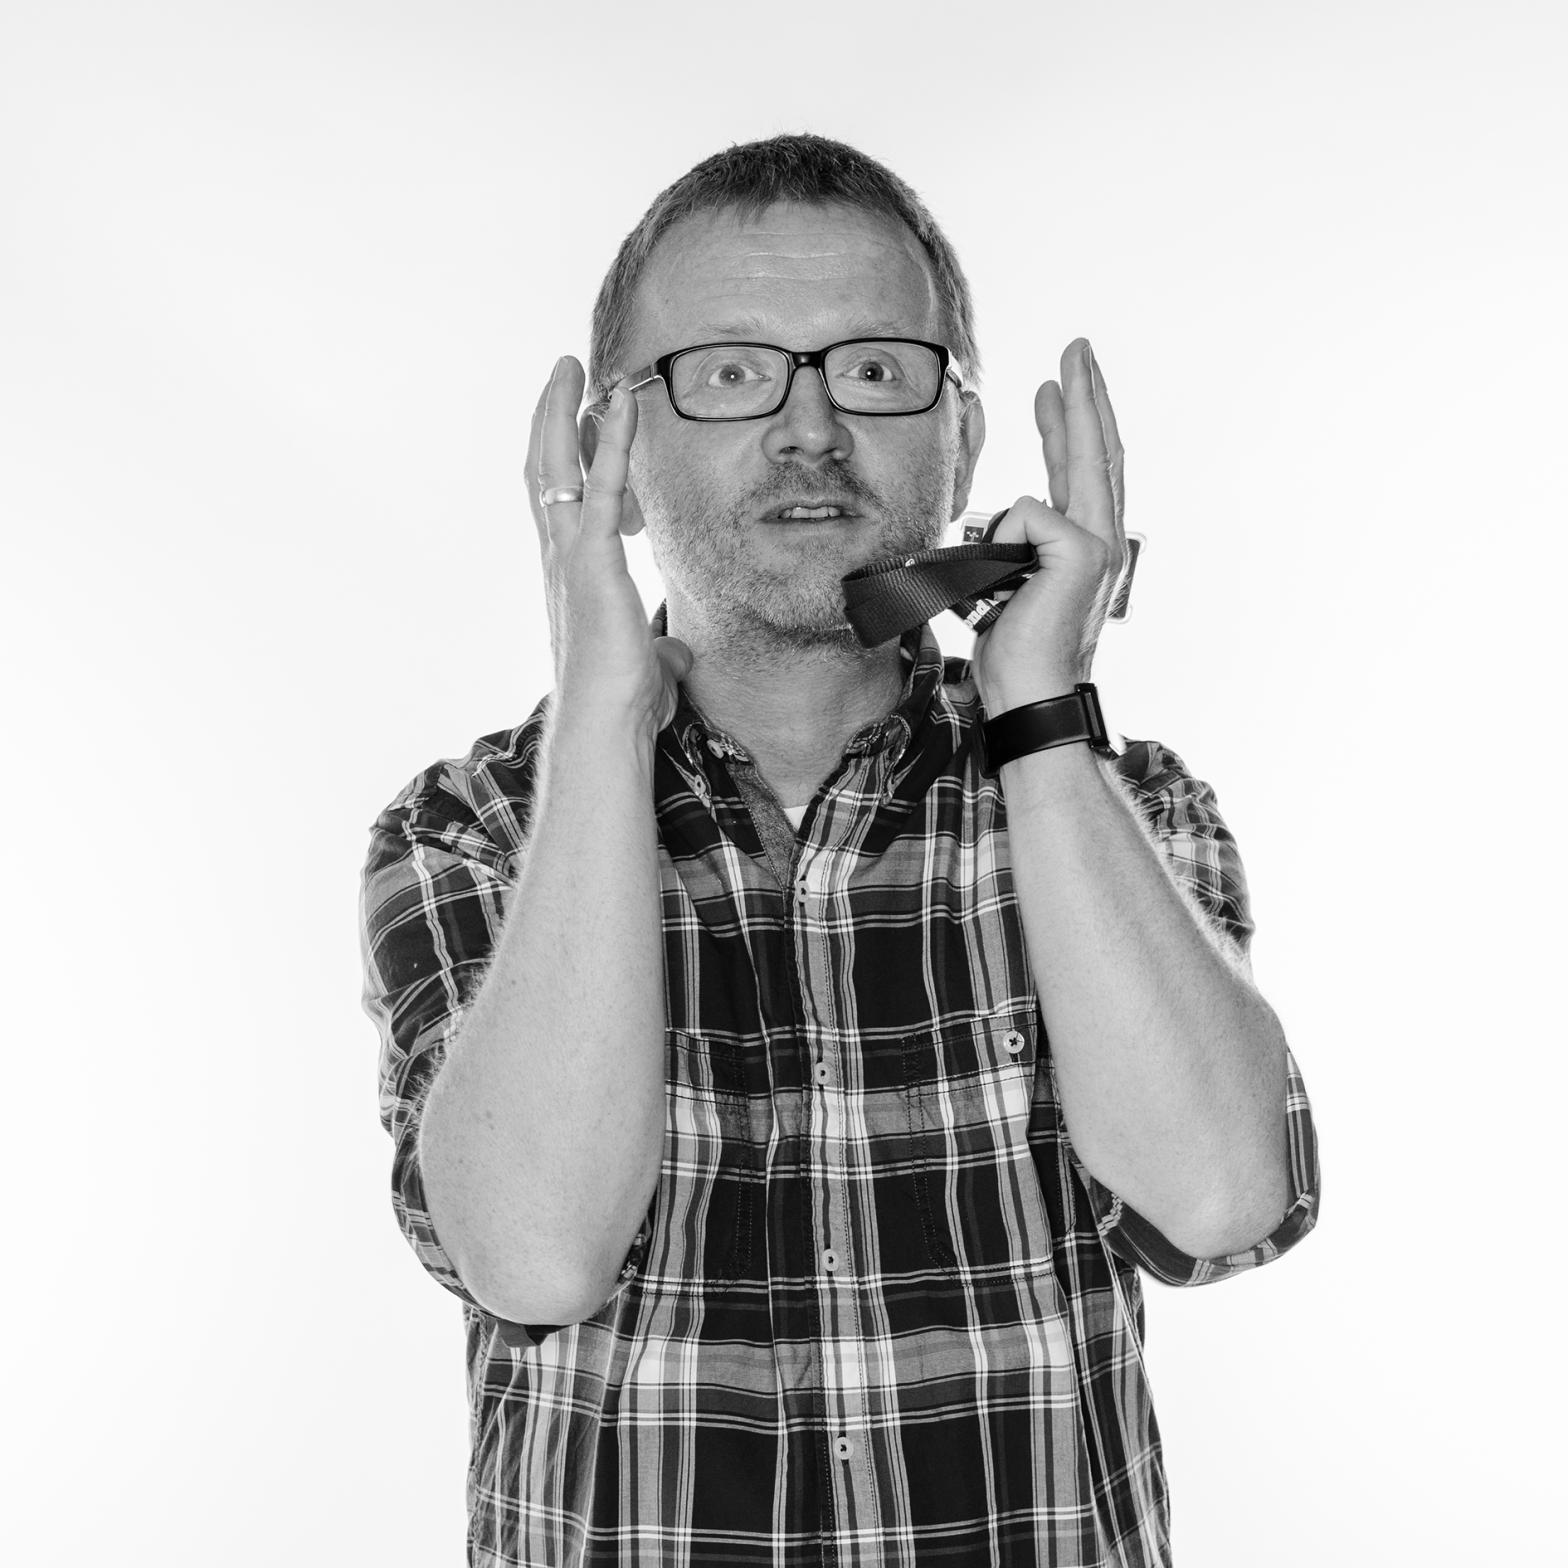 Holger Hellinger offers Publicis Sapient Career